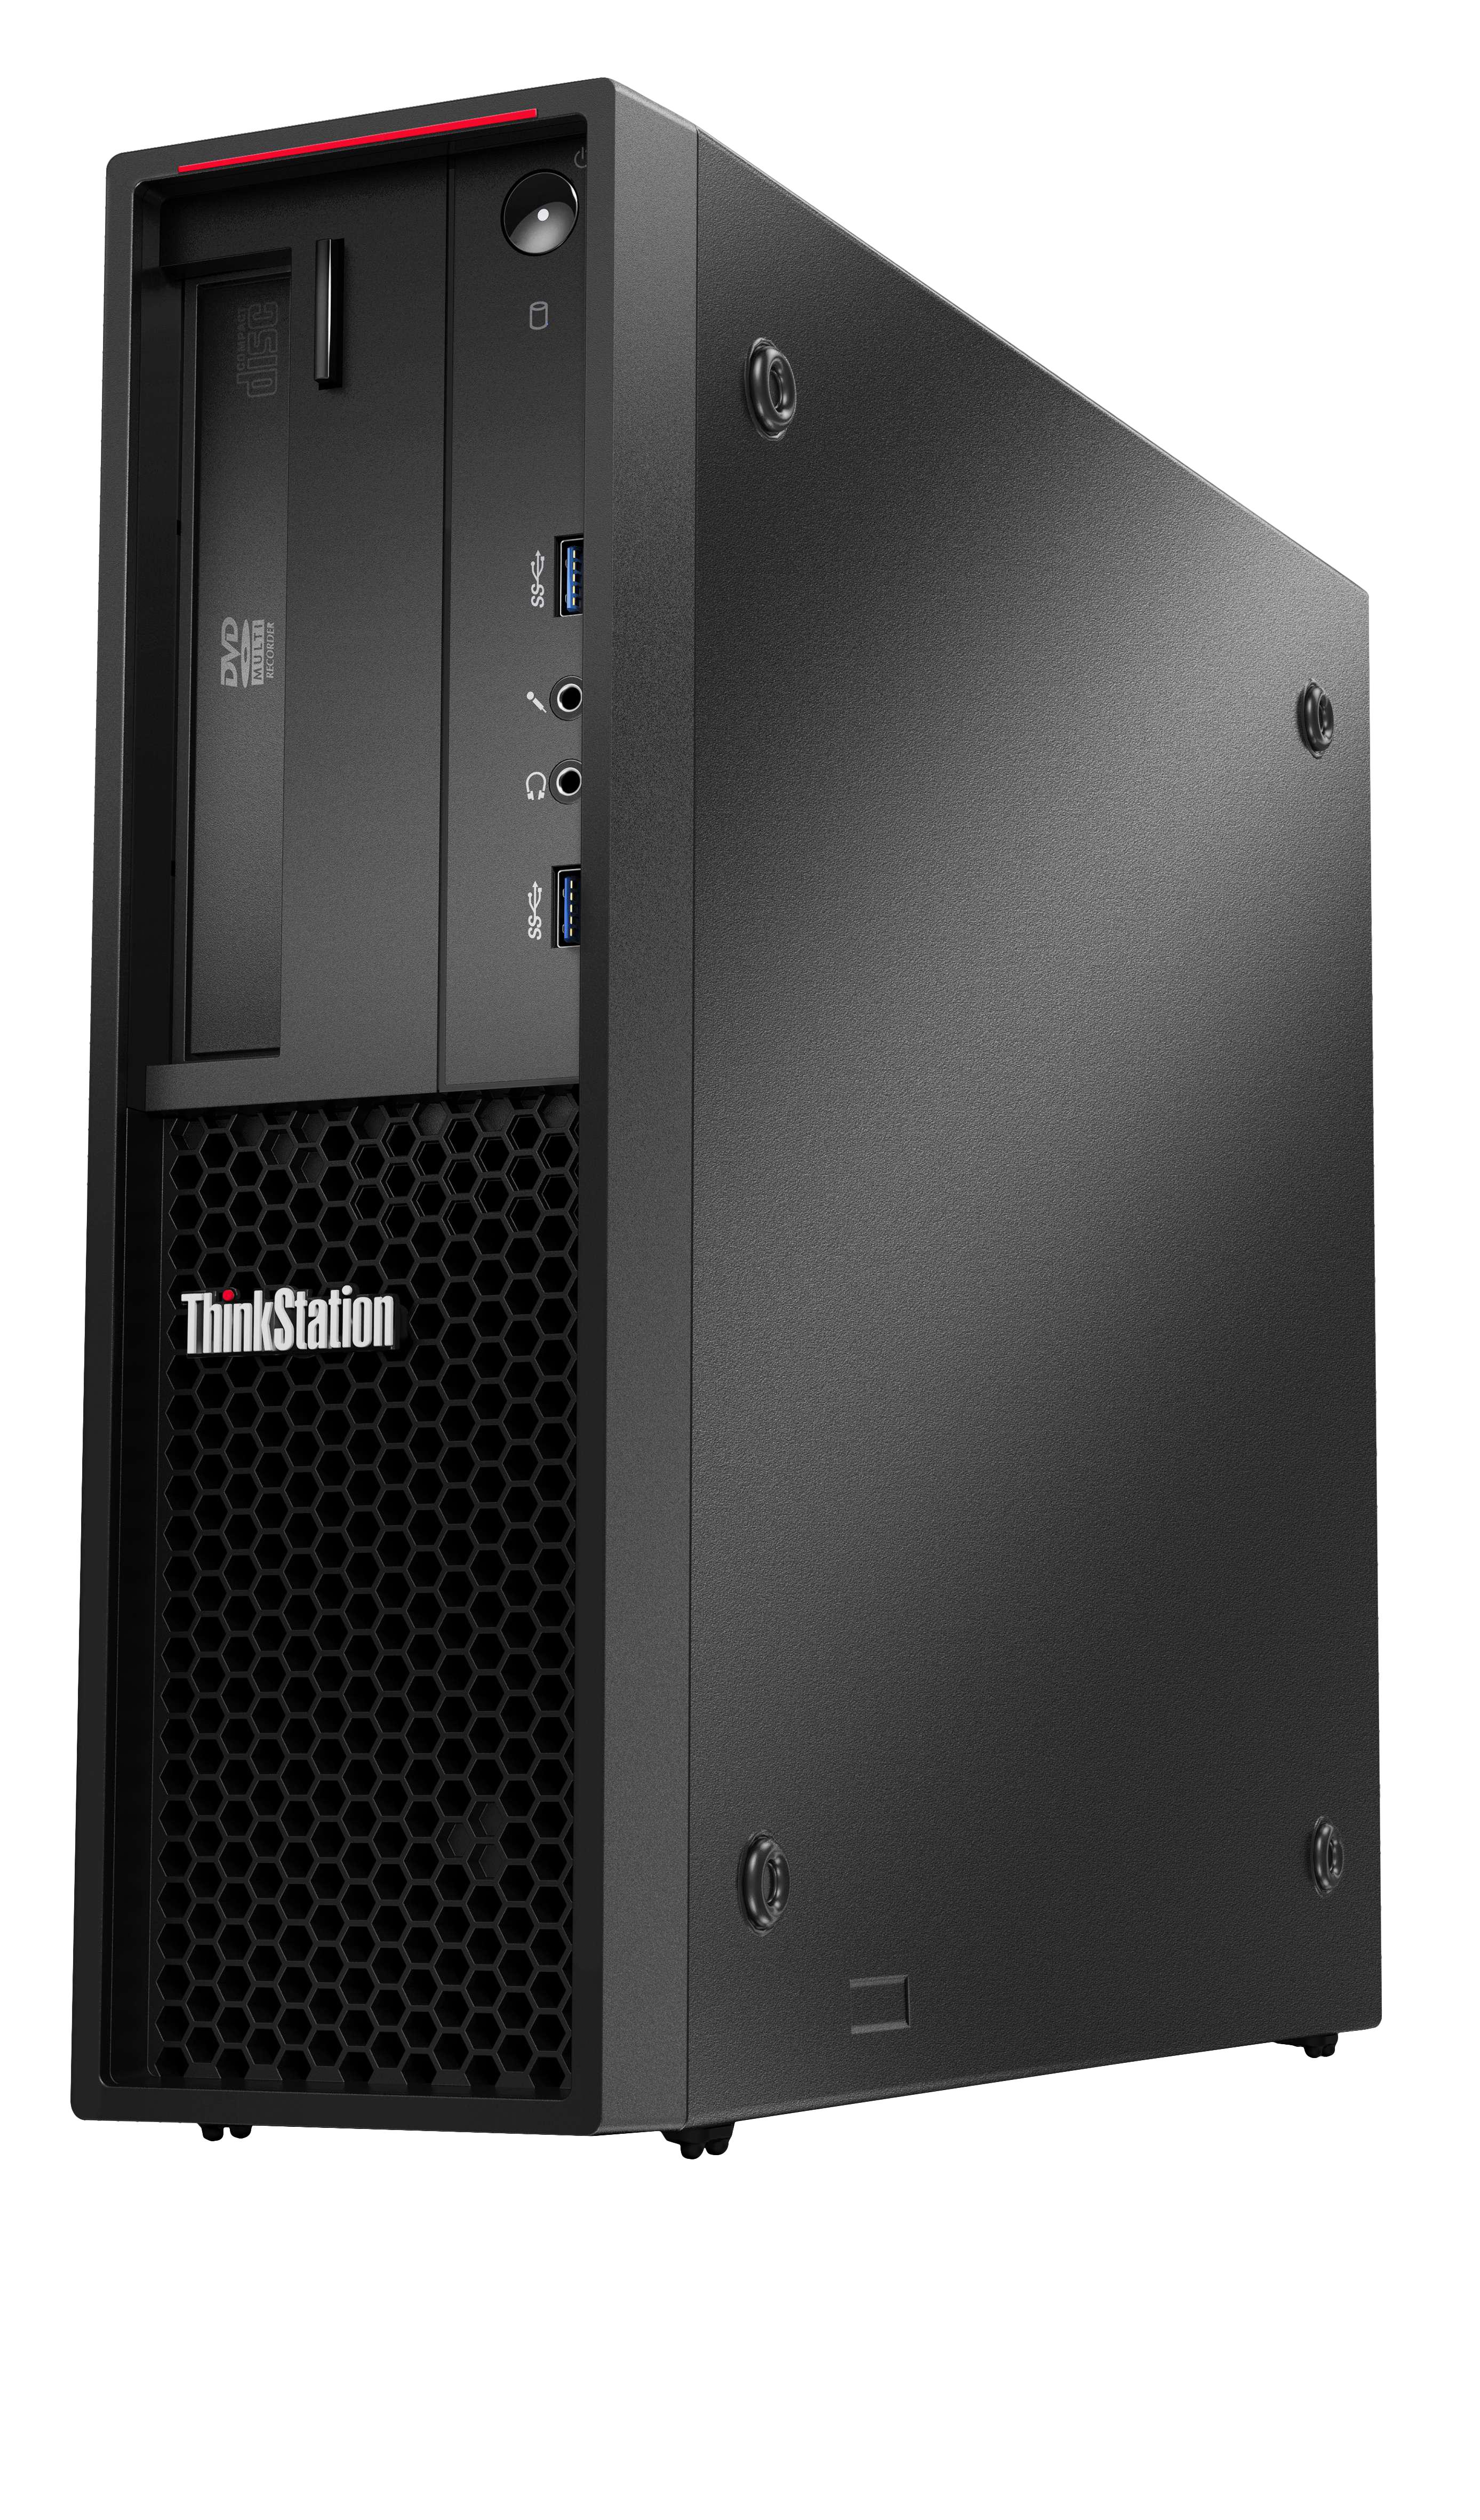 LENOVO ThinkStation P310 SFF i5-6500 1x8GB DDR4 1TB SATA DVD-RW W7P64 + W10P64 Intel HD 530 Topseller